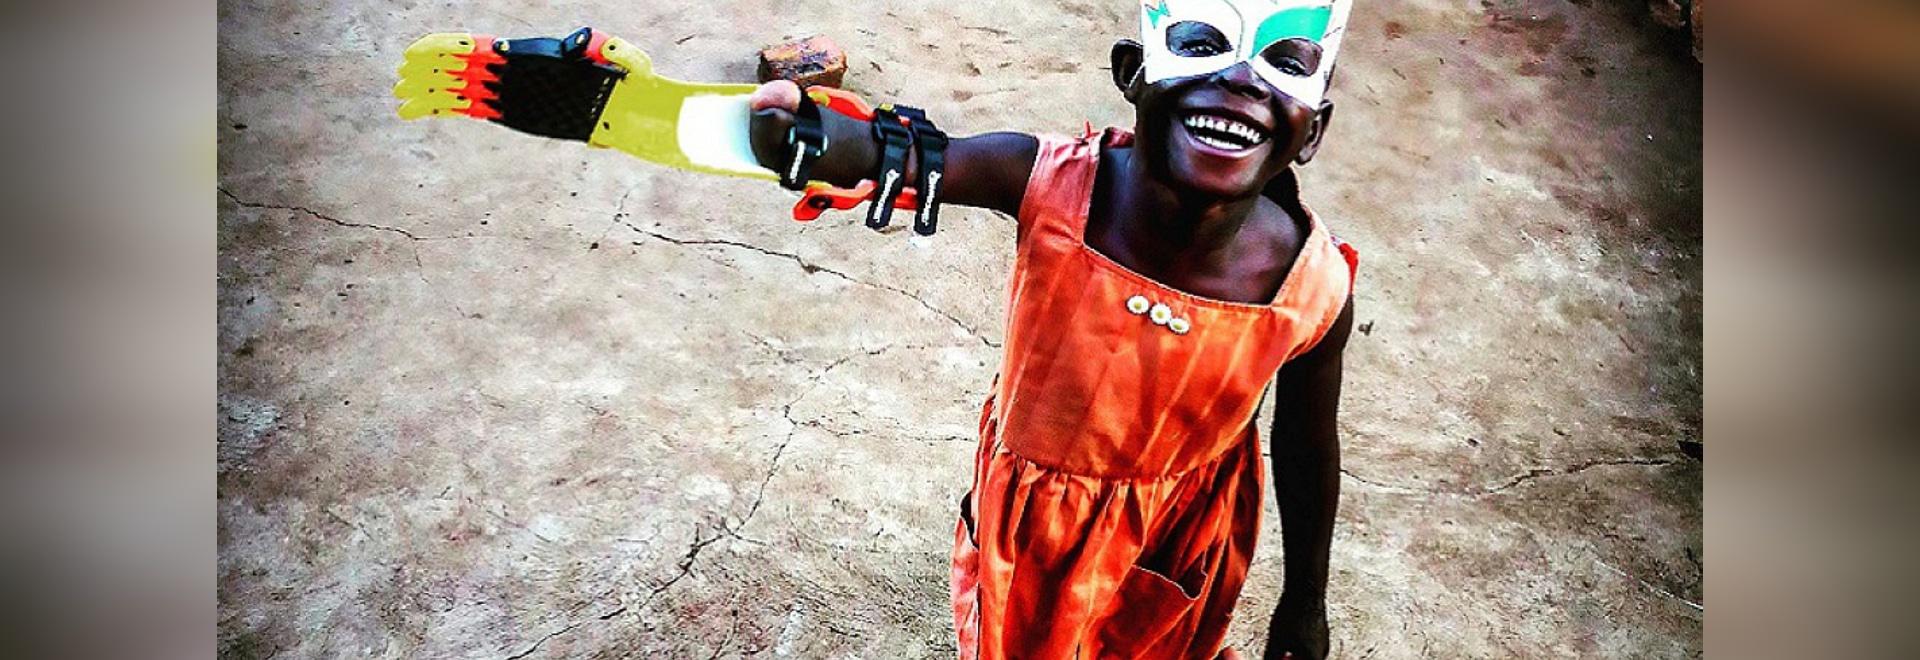 Un futuro di Digital per la sanità in Africa